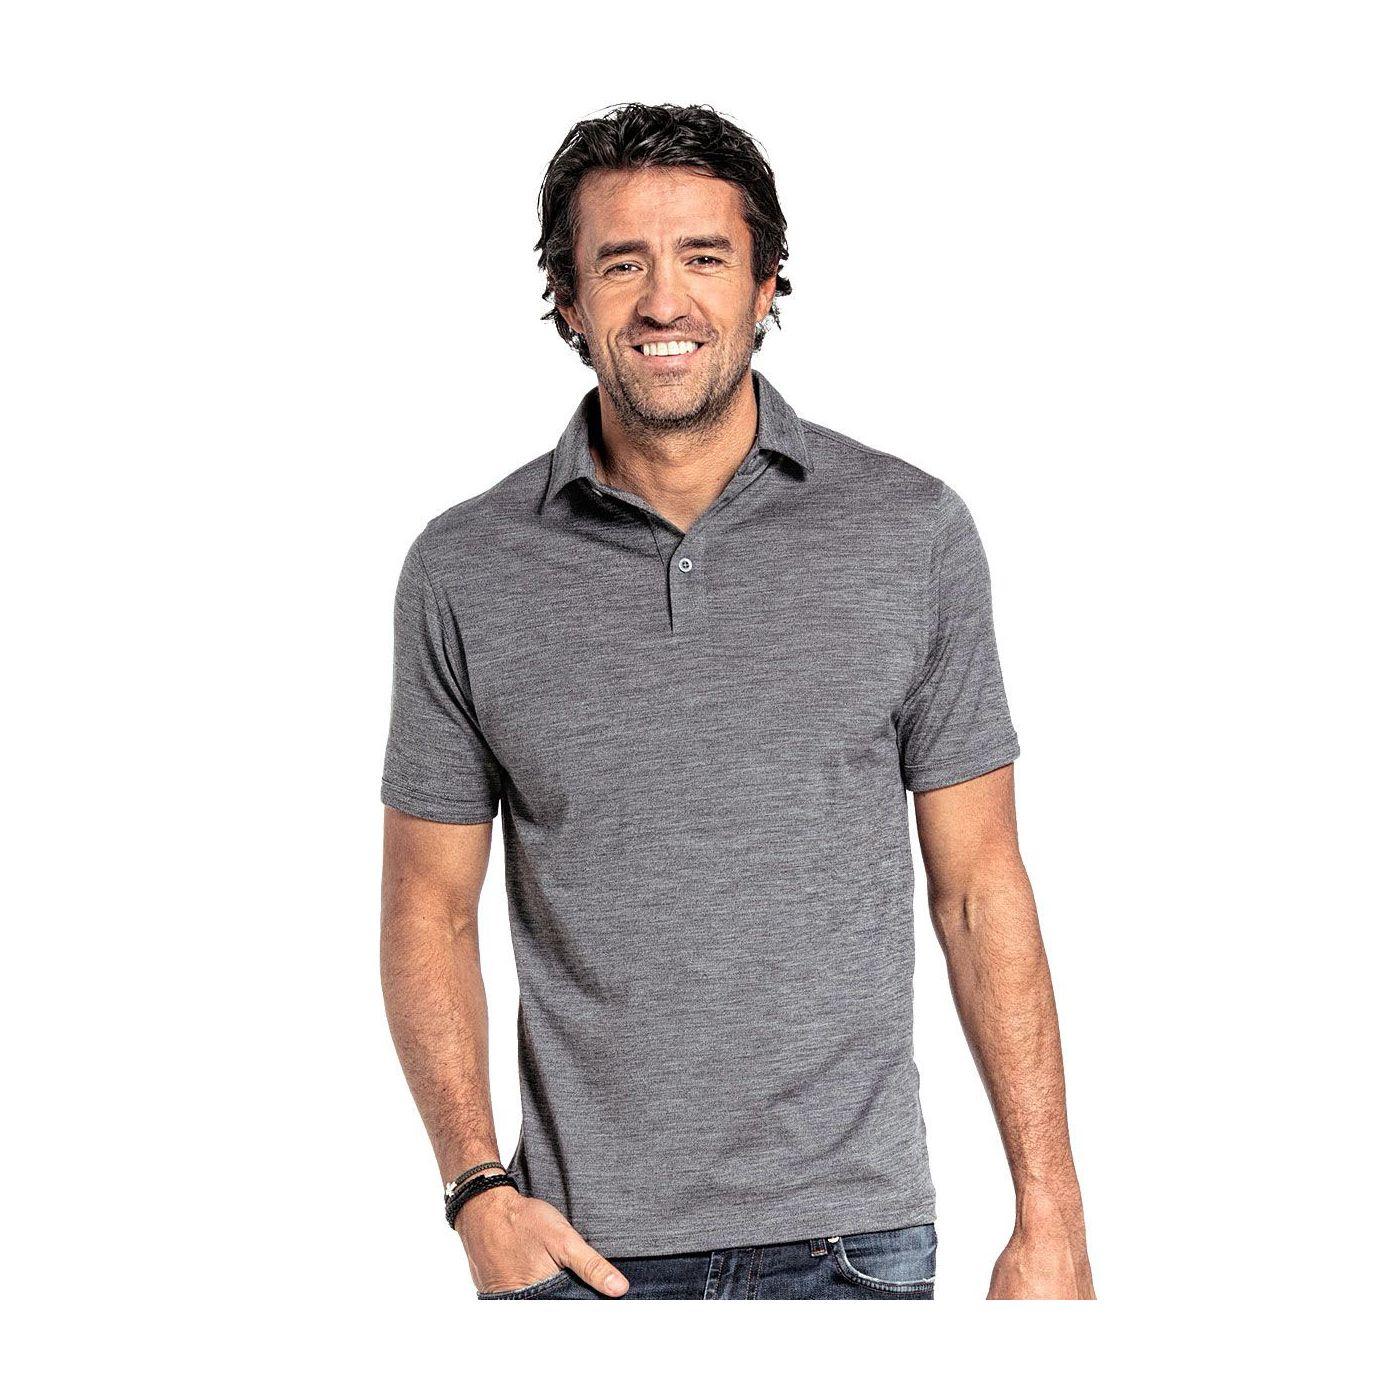 Shirt Polo Short Sleeve Grey Charcoal